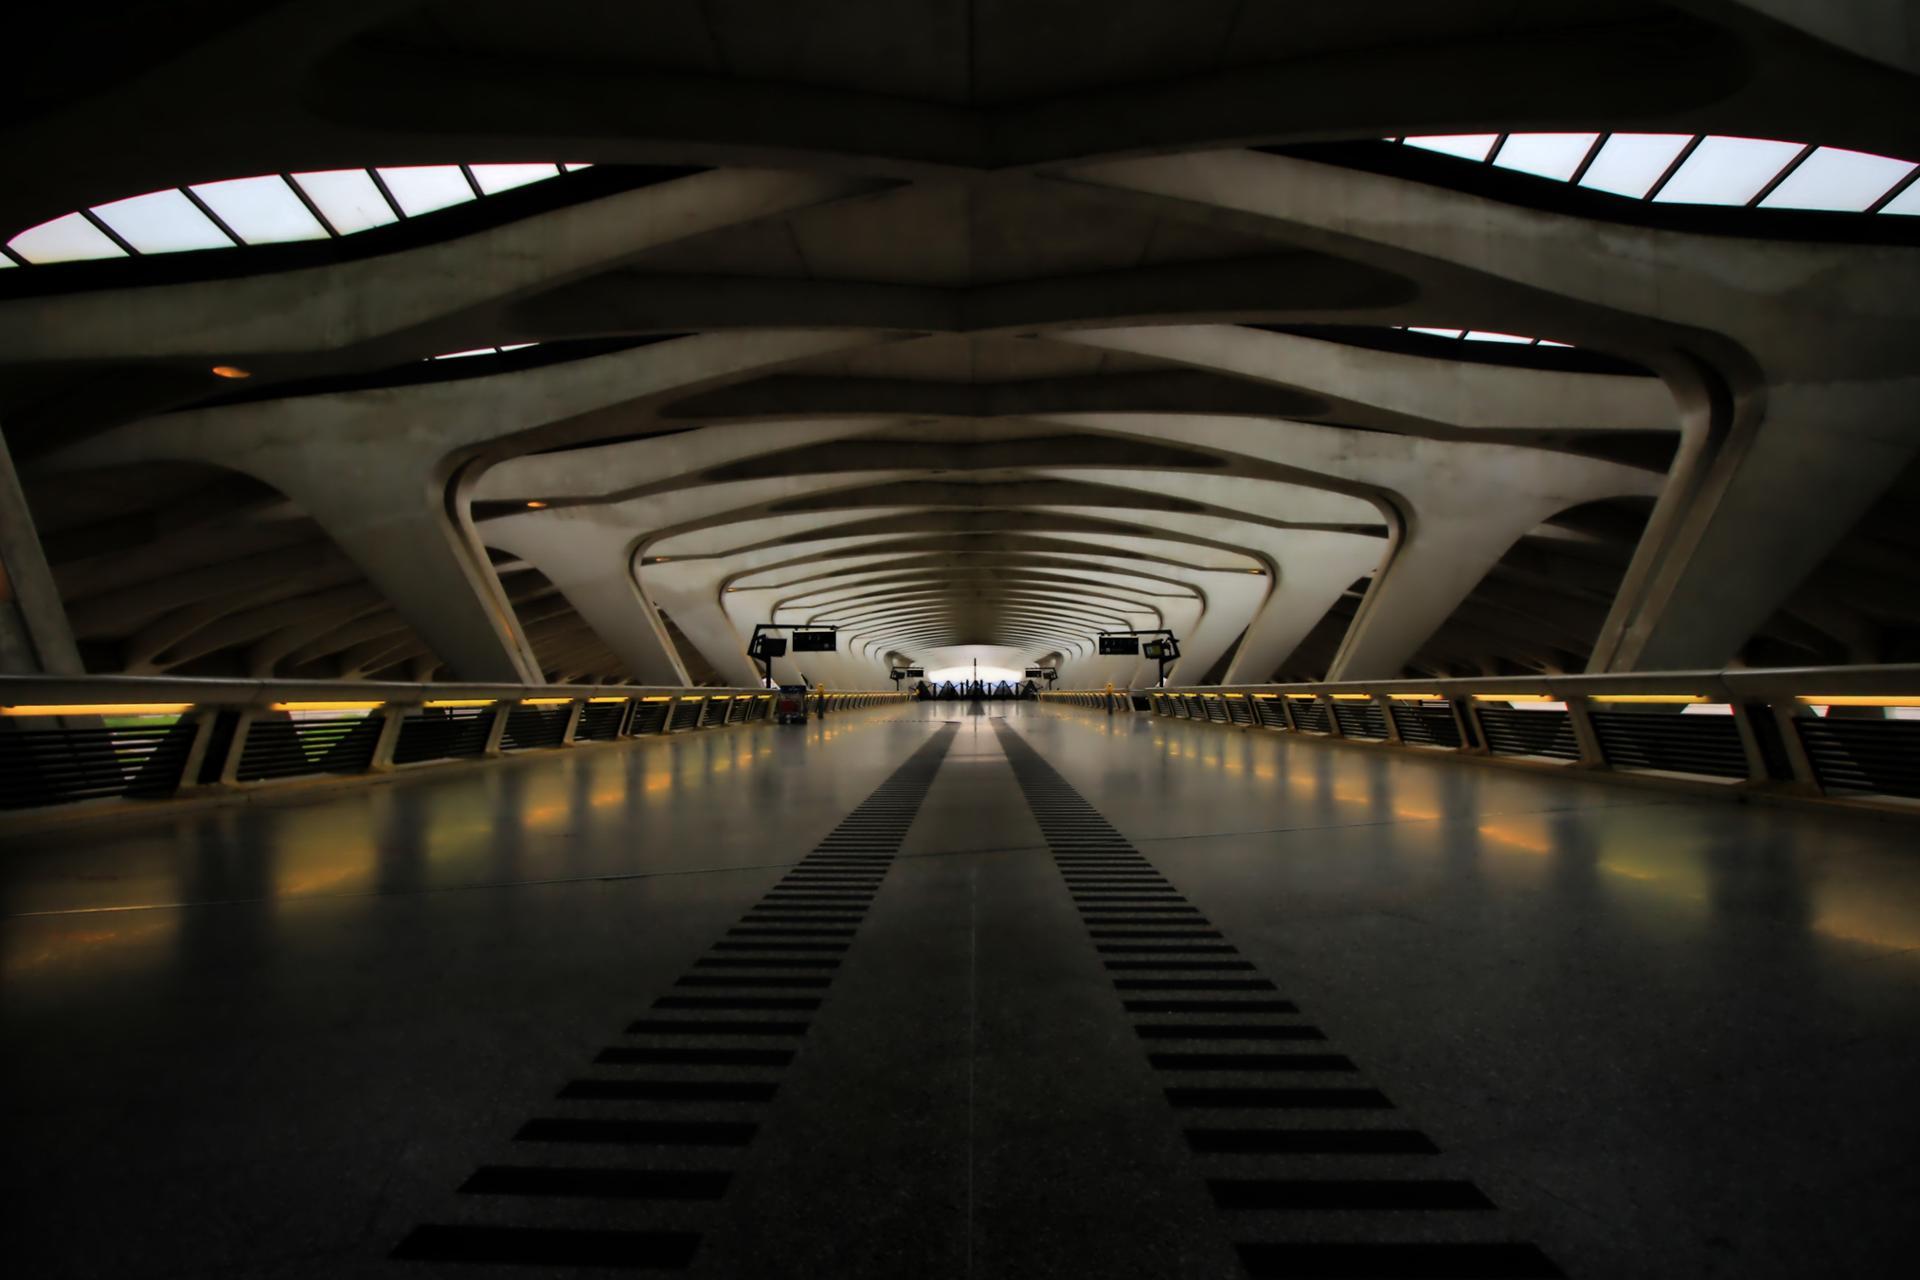 aeroport st exupery interieur